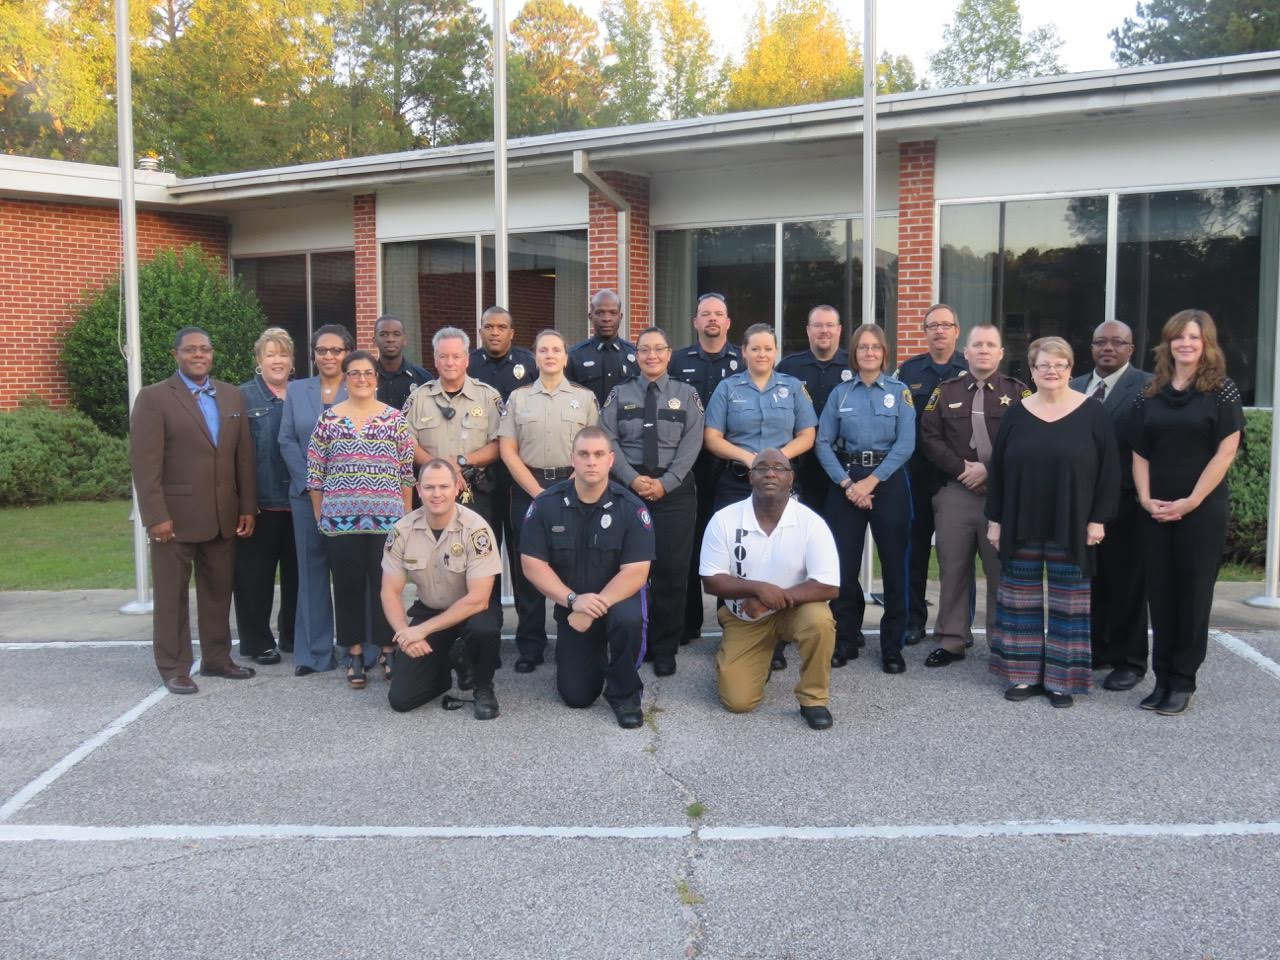 Mississippi D.A.R.E. Officer Training 2015 Graduates